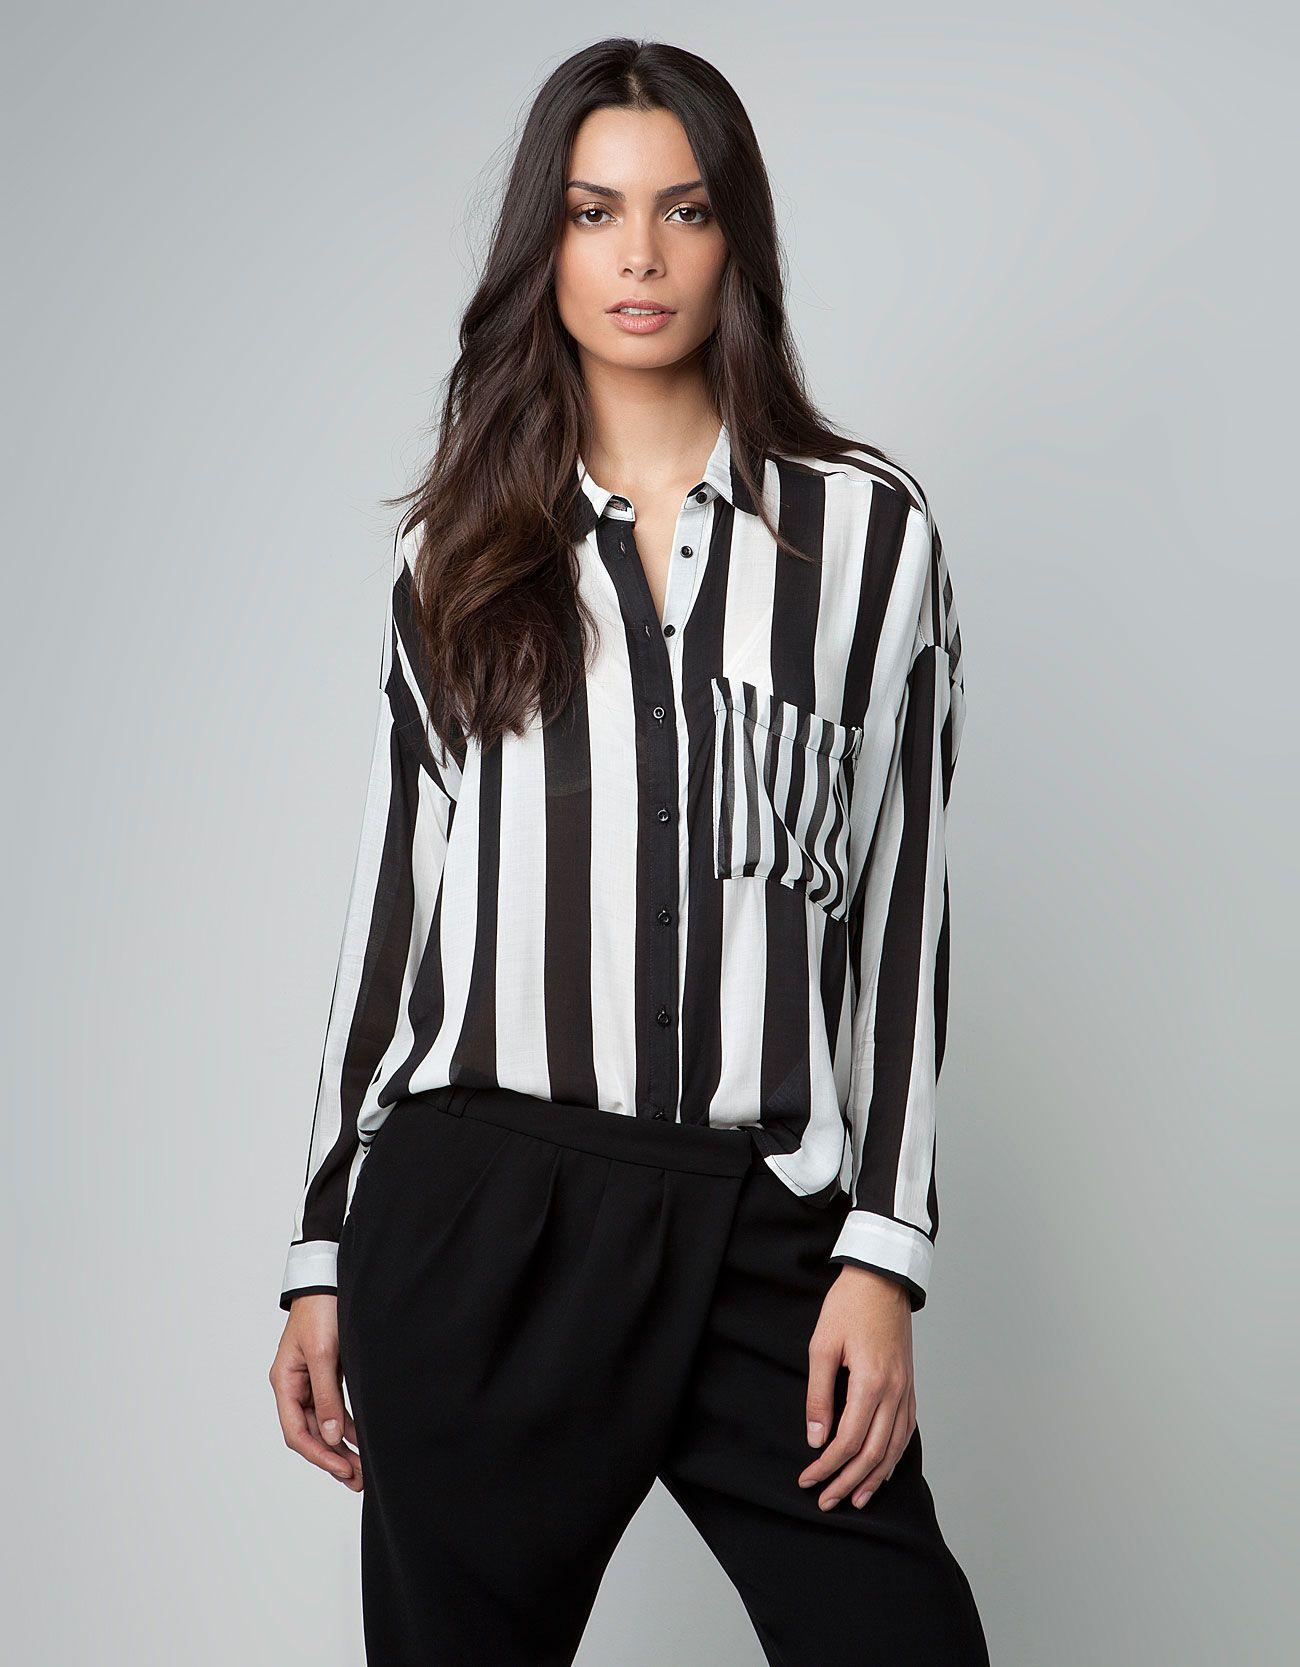 ca80885665 Bershka España - Camisa Bershka rayas combinadas. blusa a lo